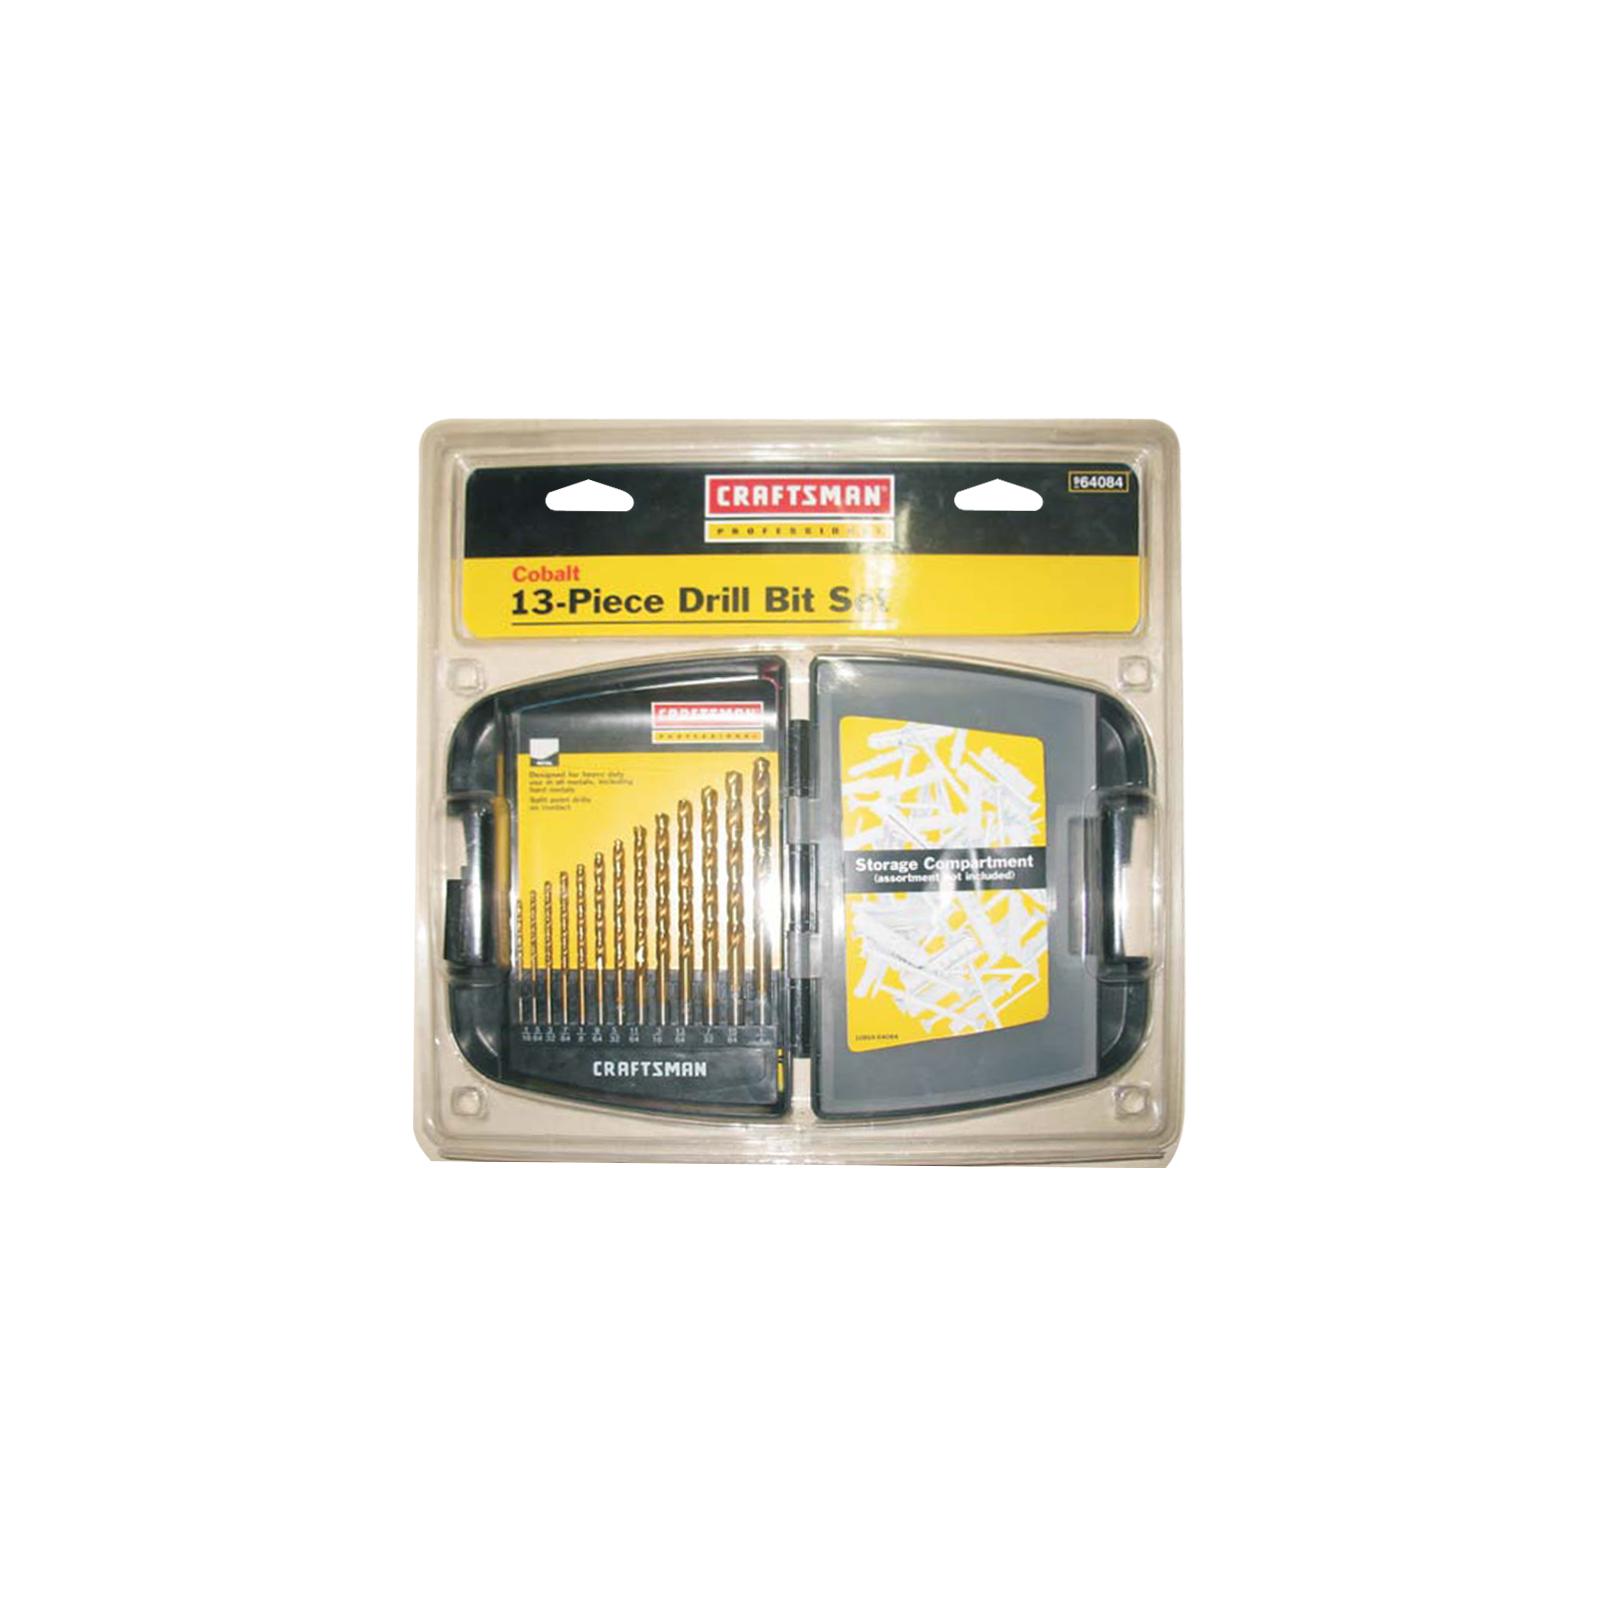 Craftsman Professional 13 pc. Cobalt Drill Bit Set